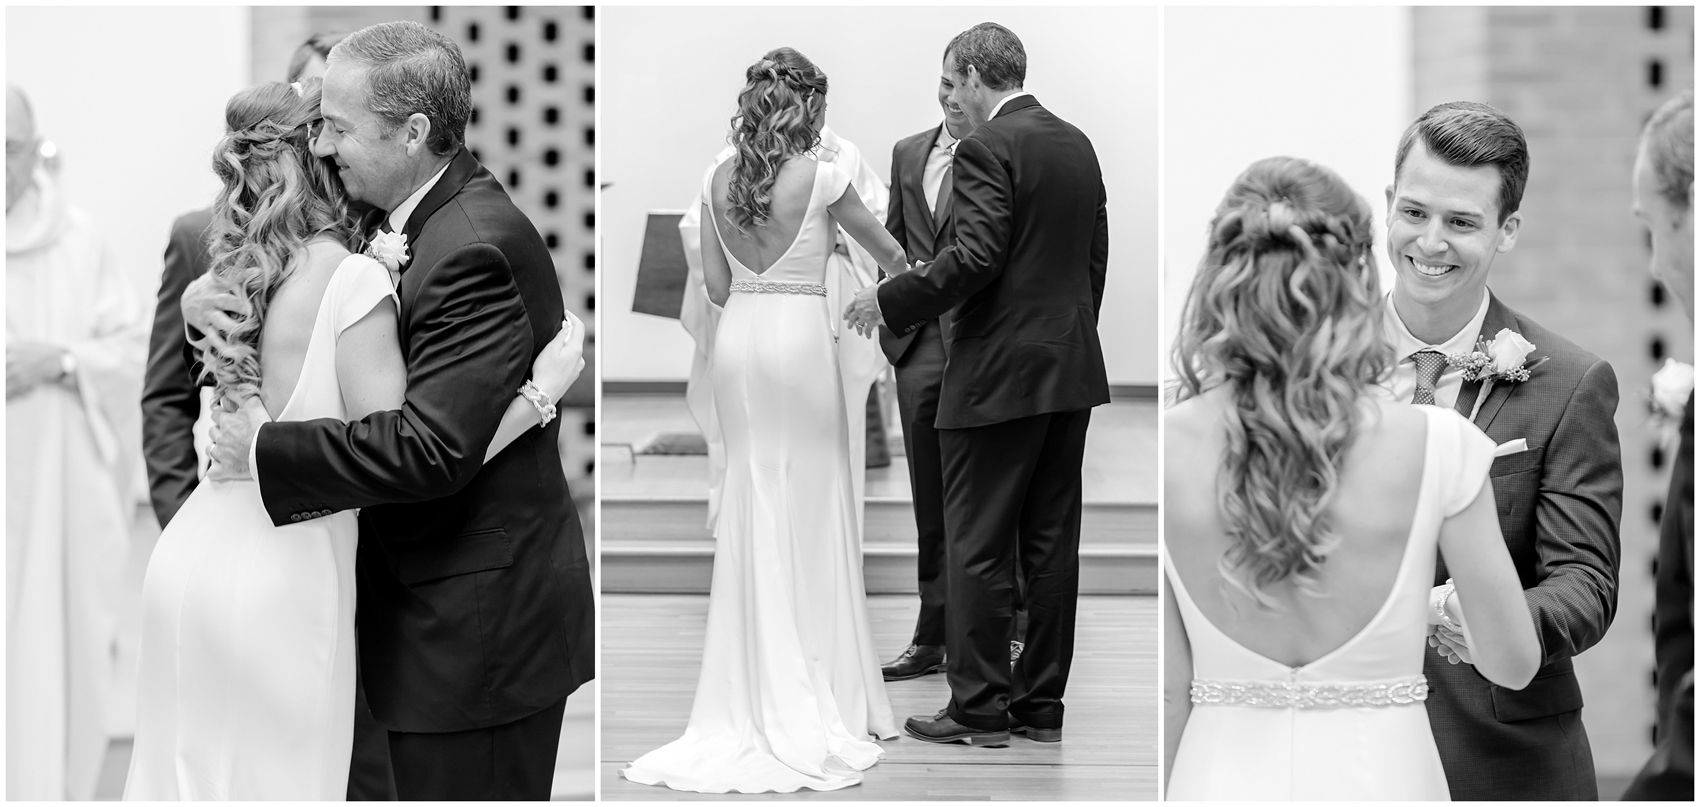 ritz-carlton-georgetown-wedding-washington-dc-photography-liz-stewart-photo-00014